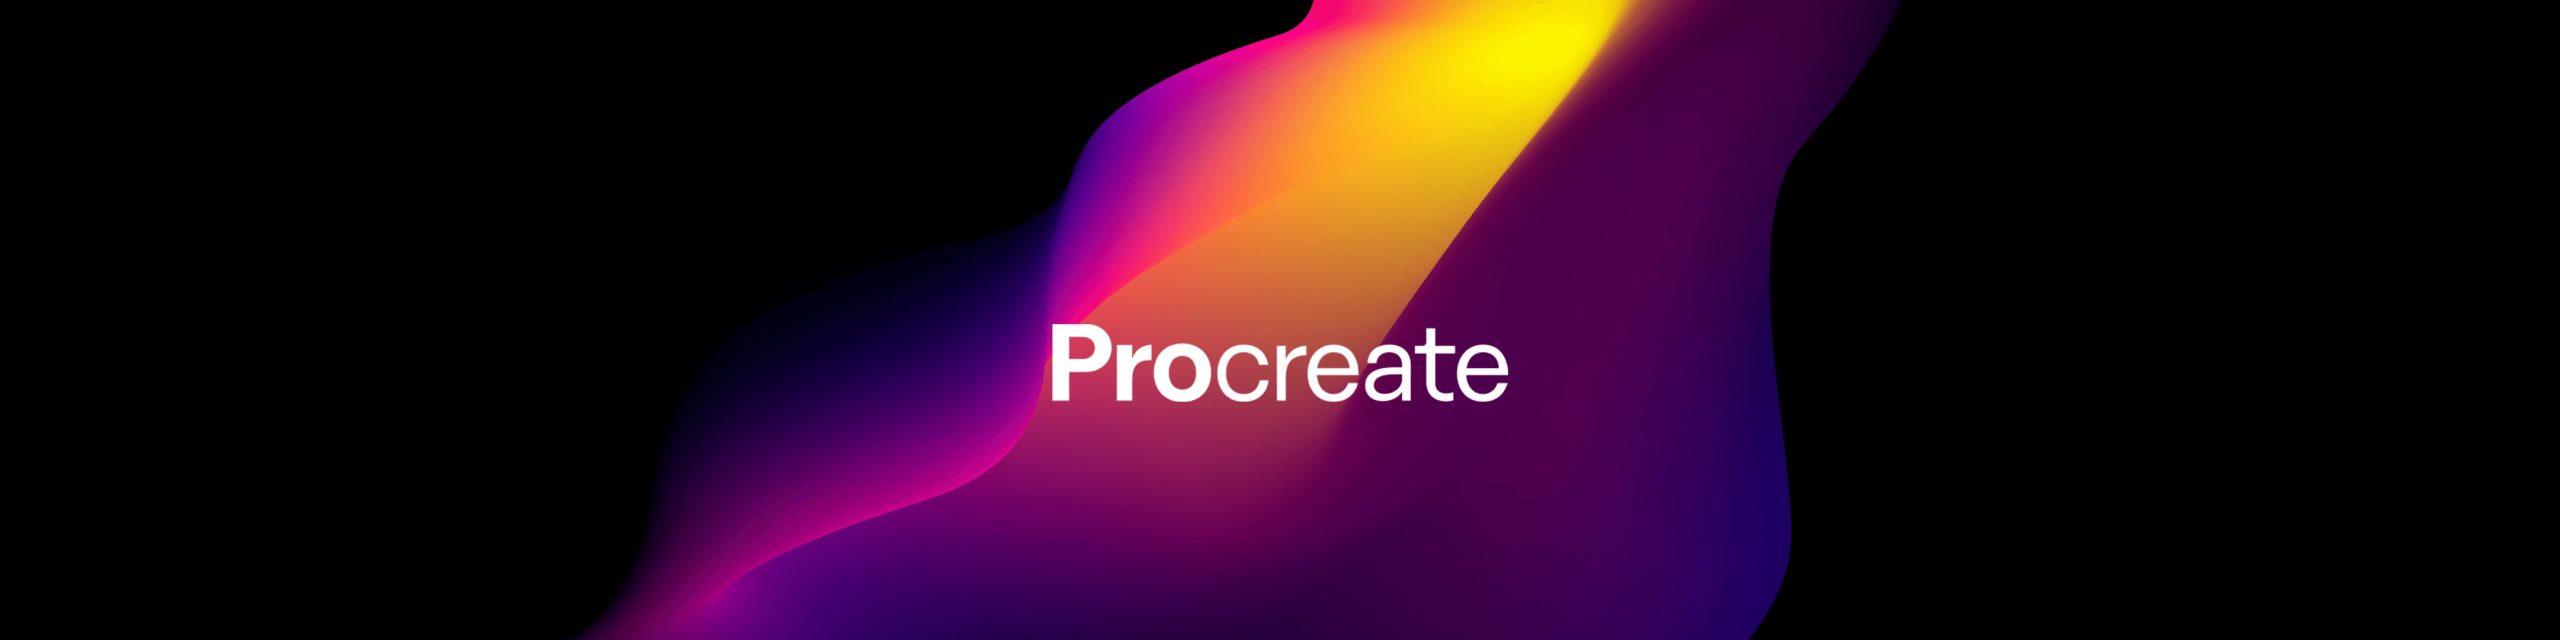 procreate best Photoshop Alternatives